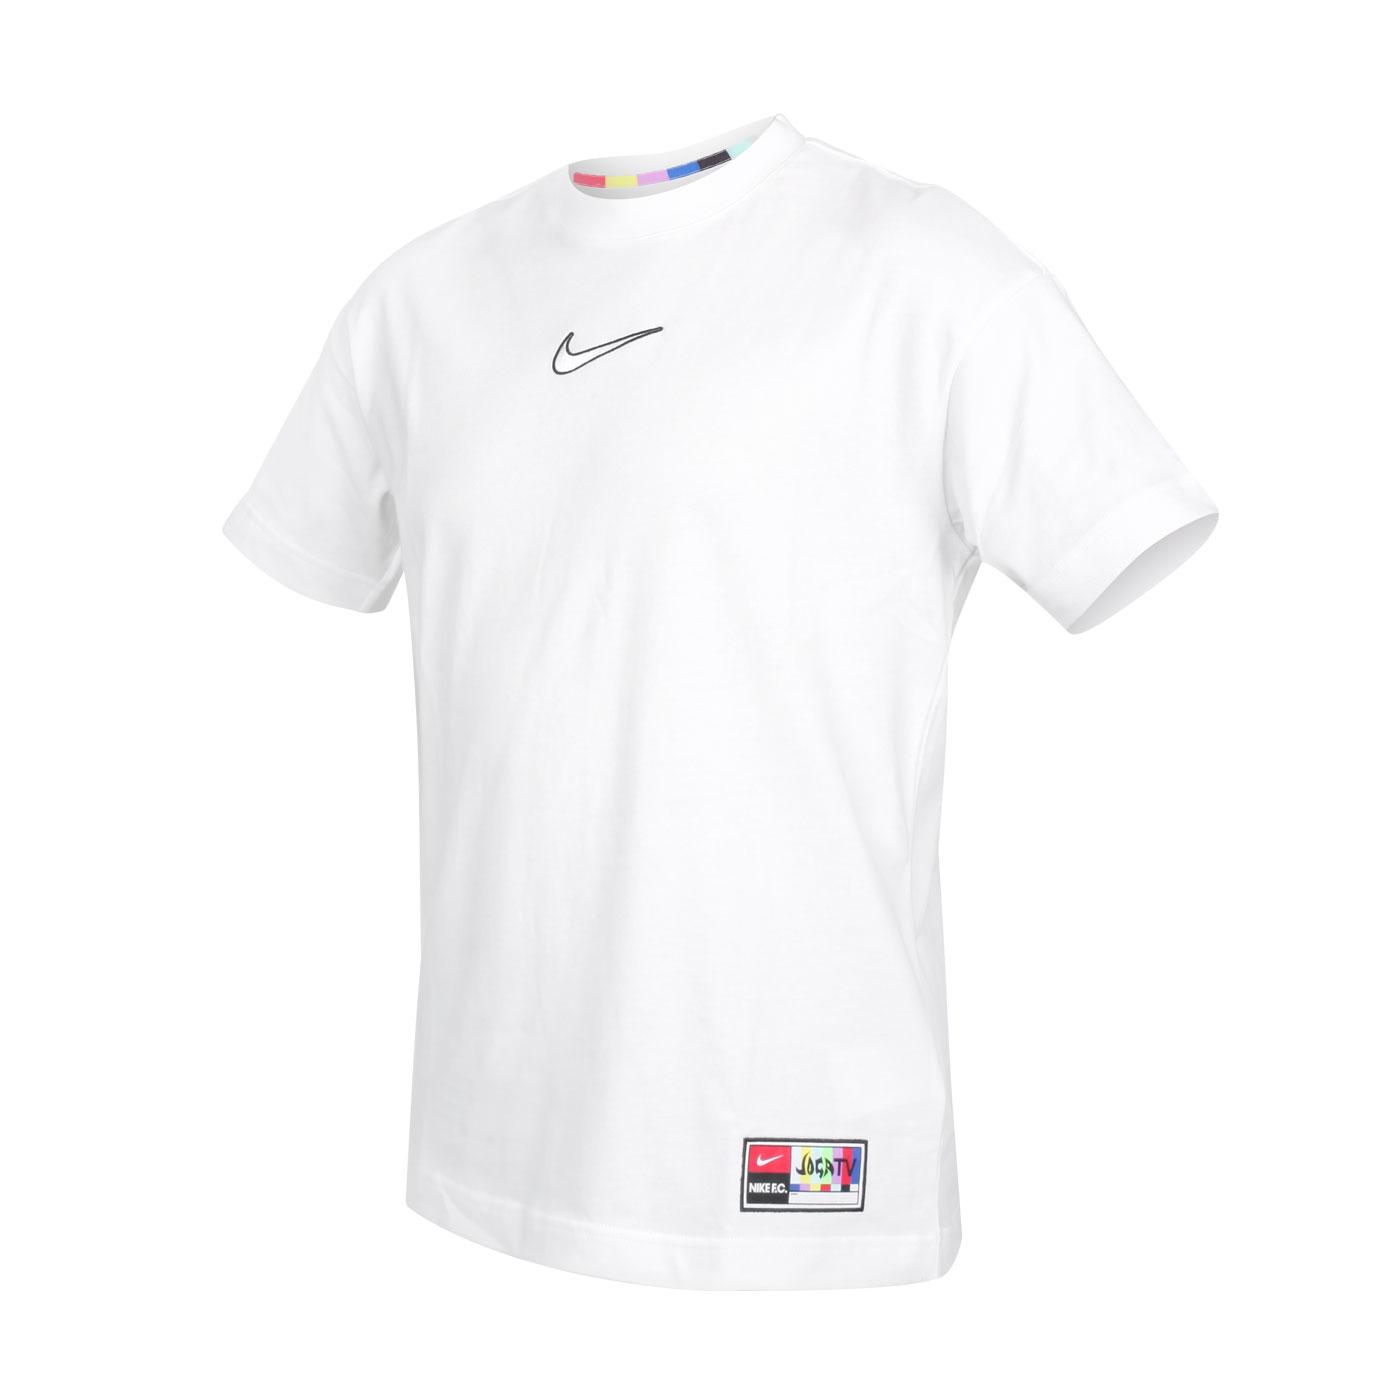 NIKE 男款短袖T恤 CZ1010-100 - 白黑